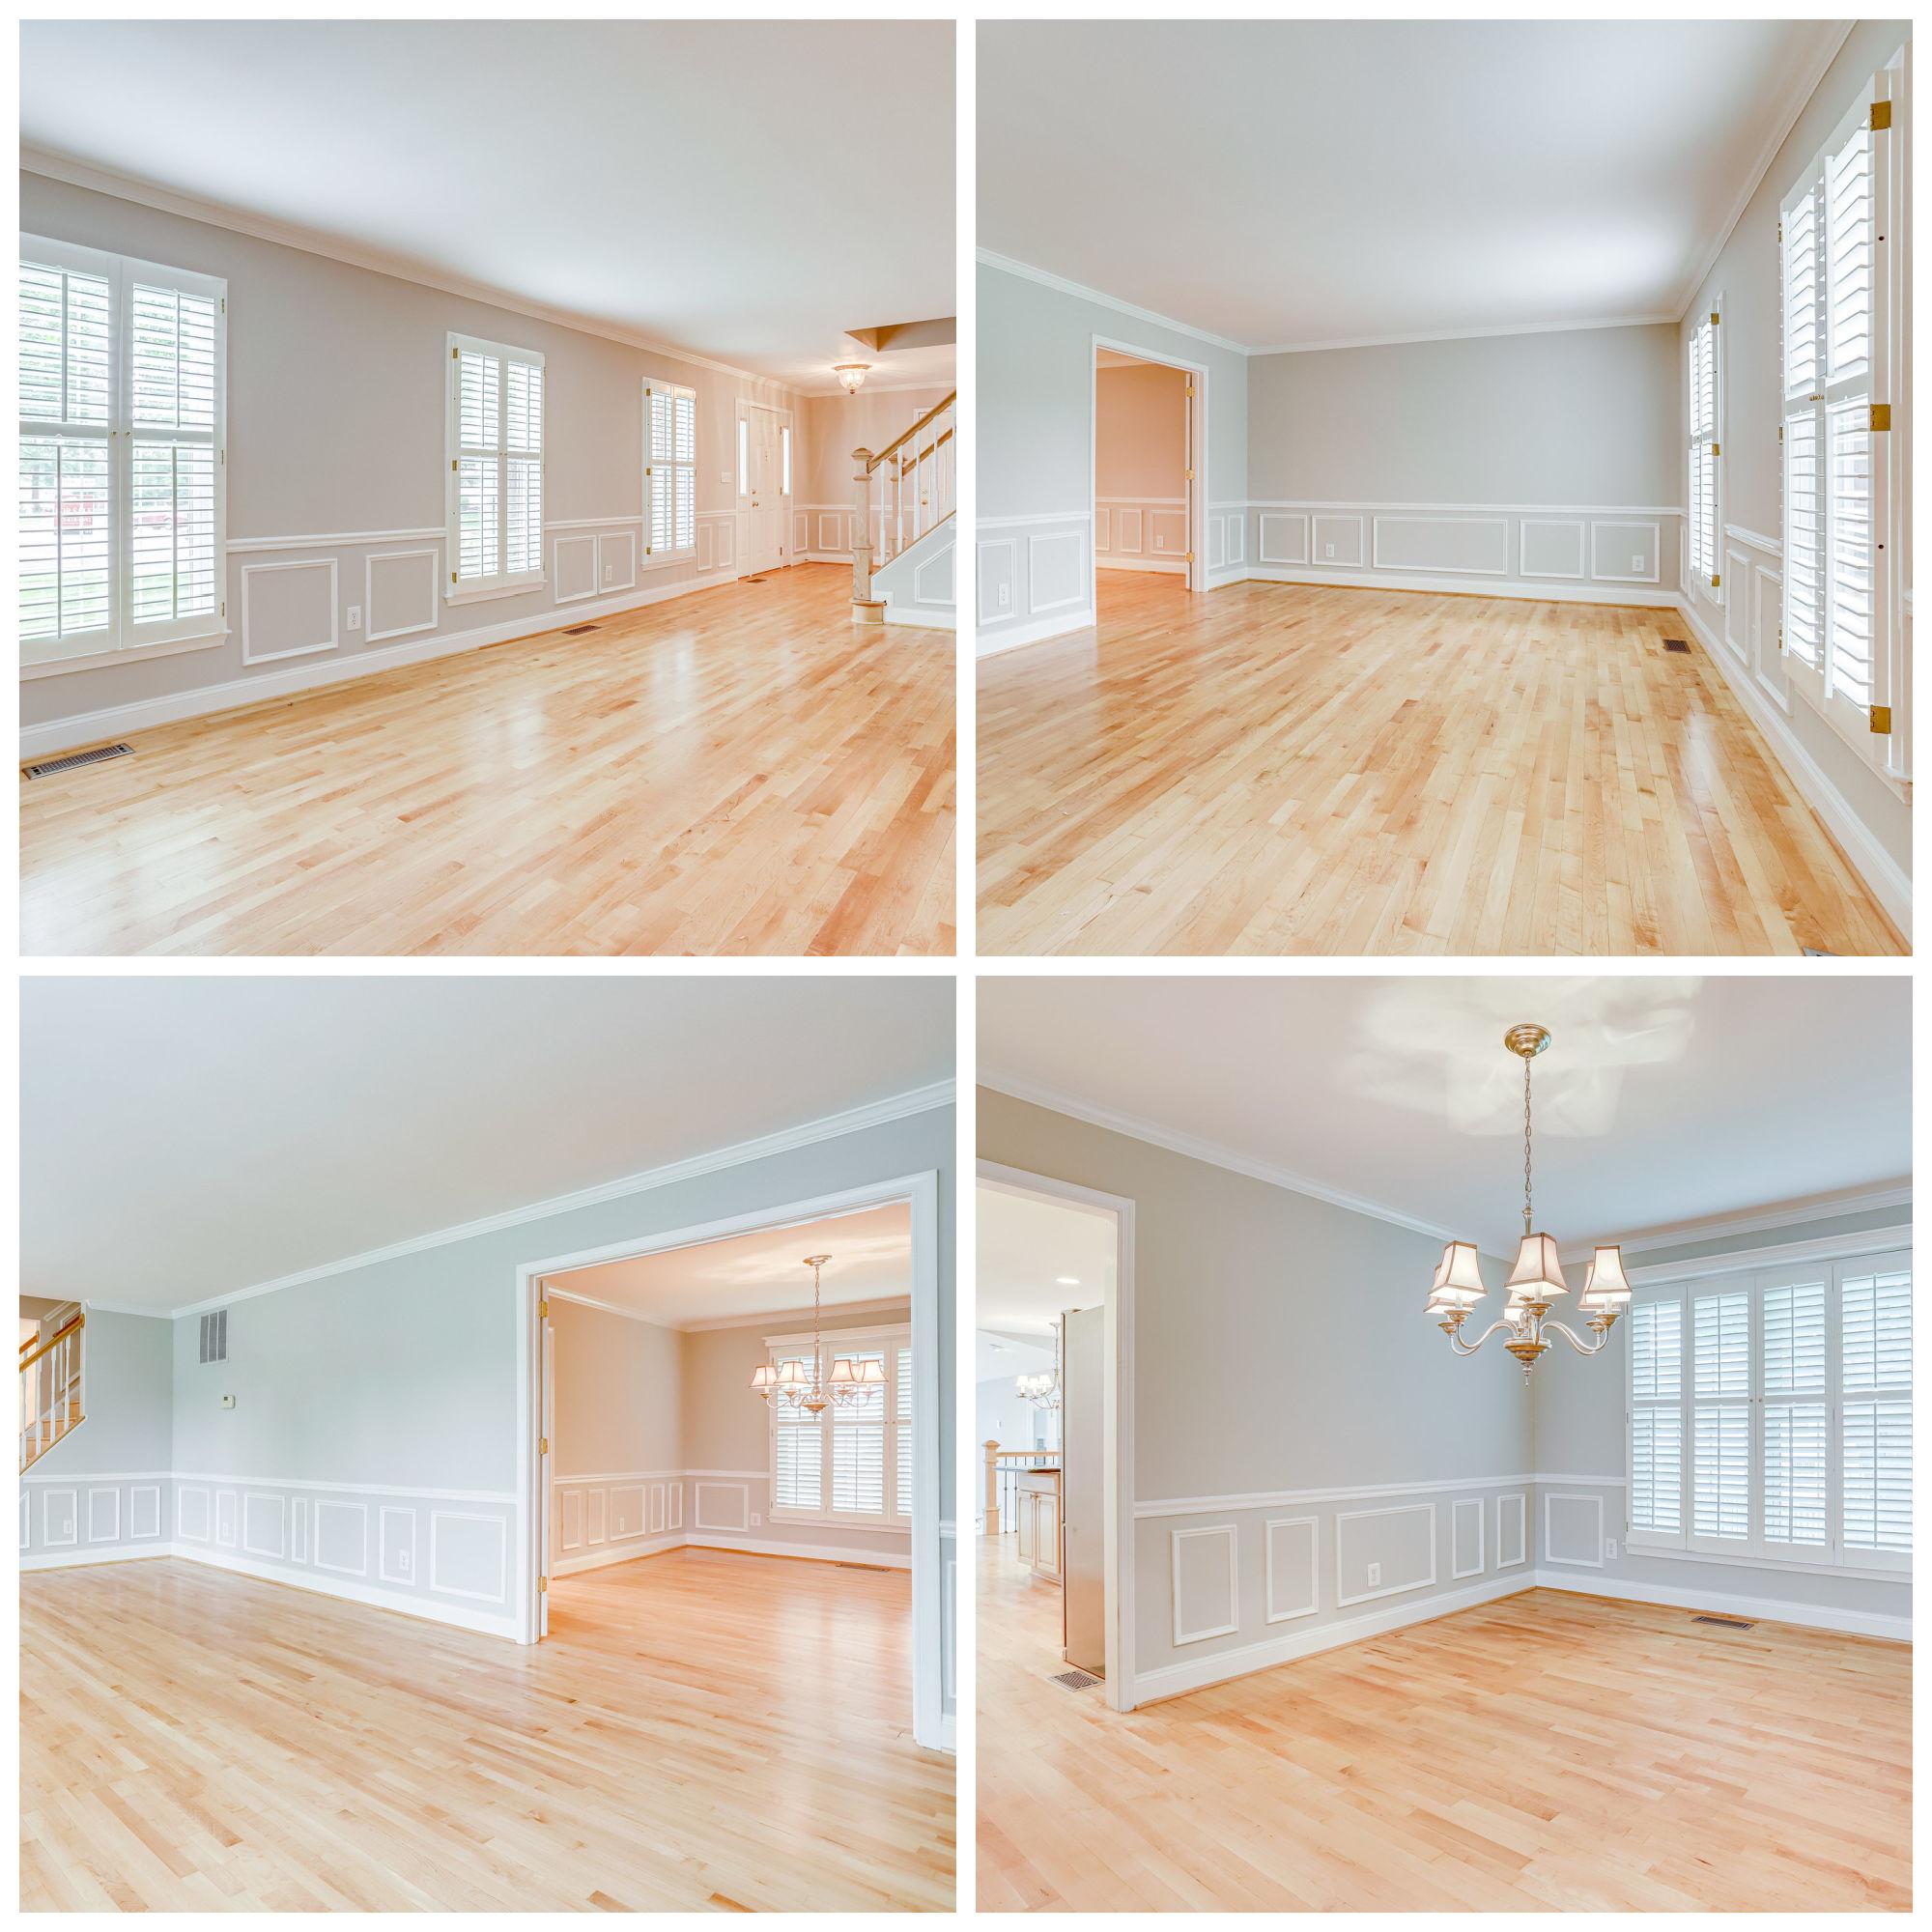 3209 Kilbrennan Ct, Herndon- Living and Dining Rooms